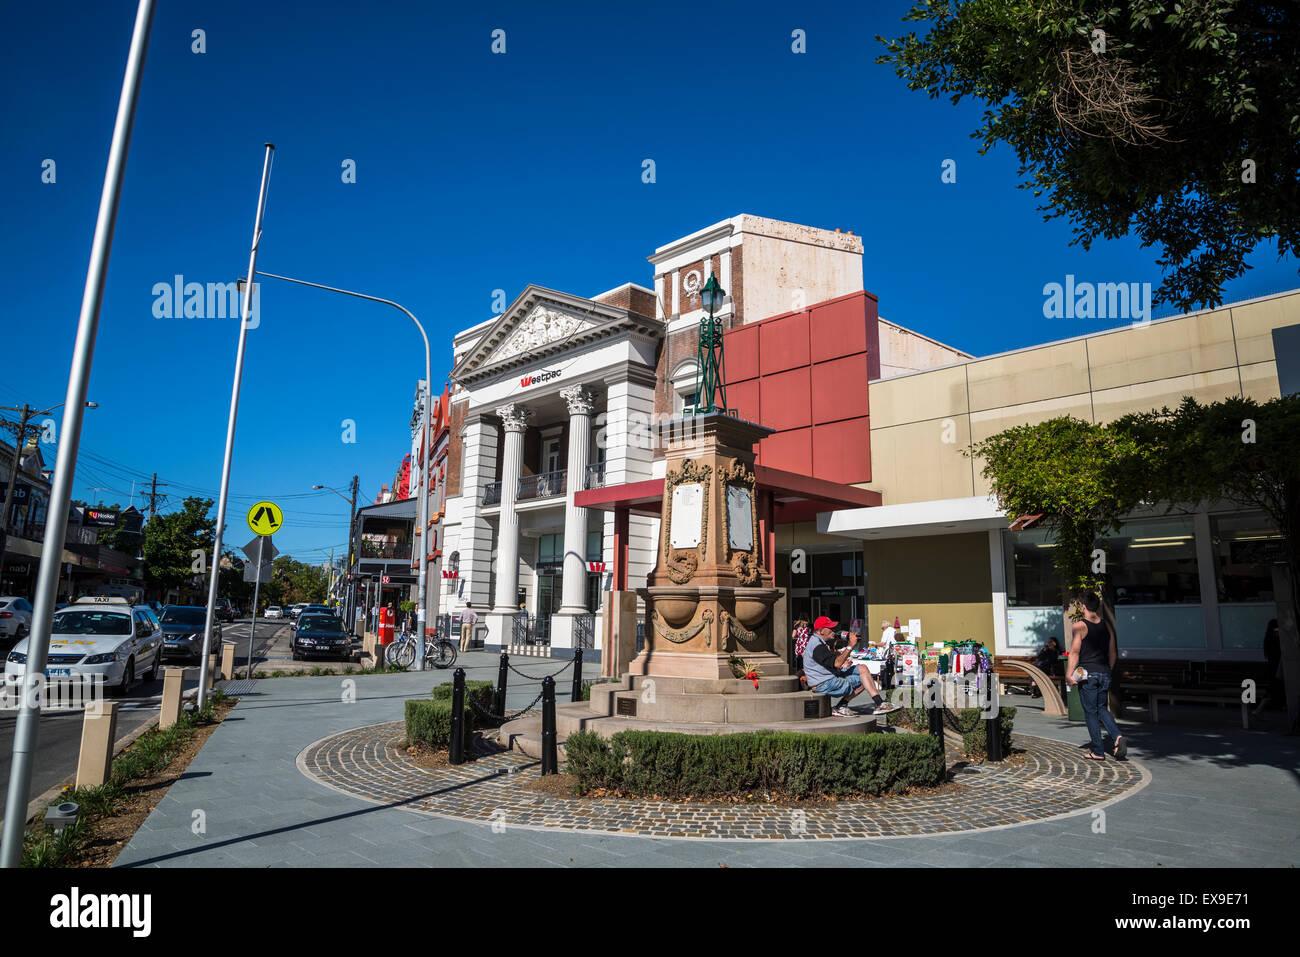 Darling Street, Balmain, Sydney, Australia - Stock Image